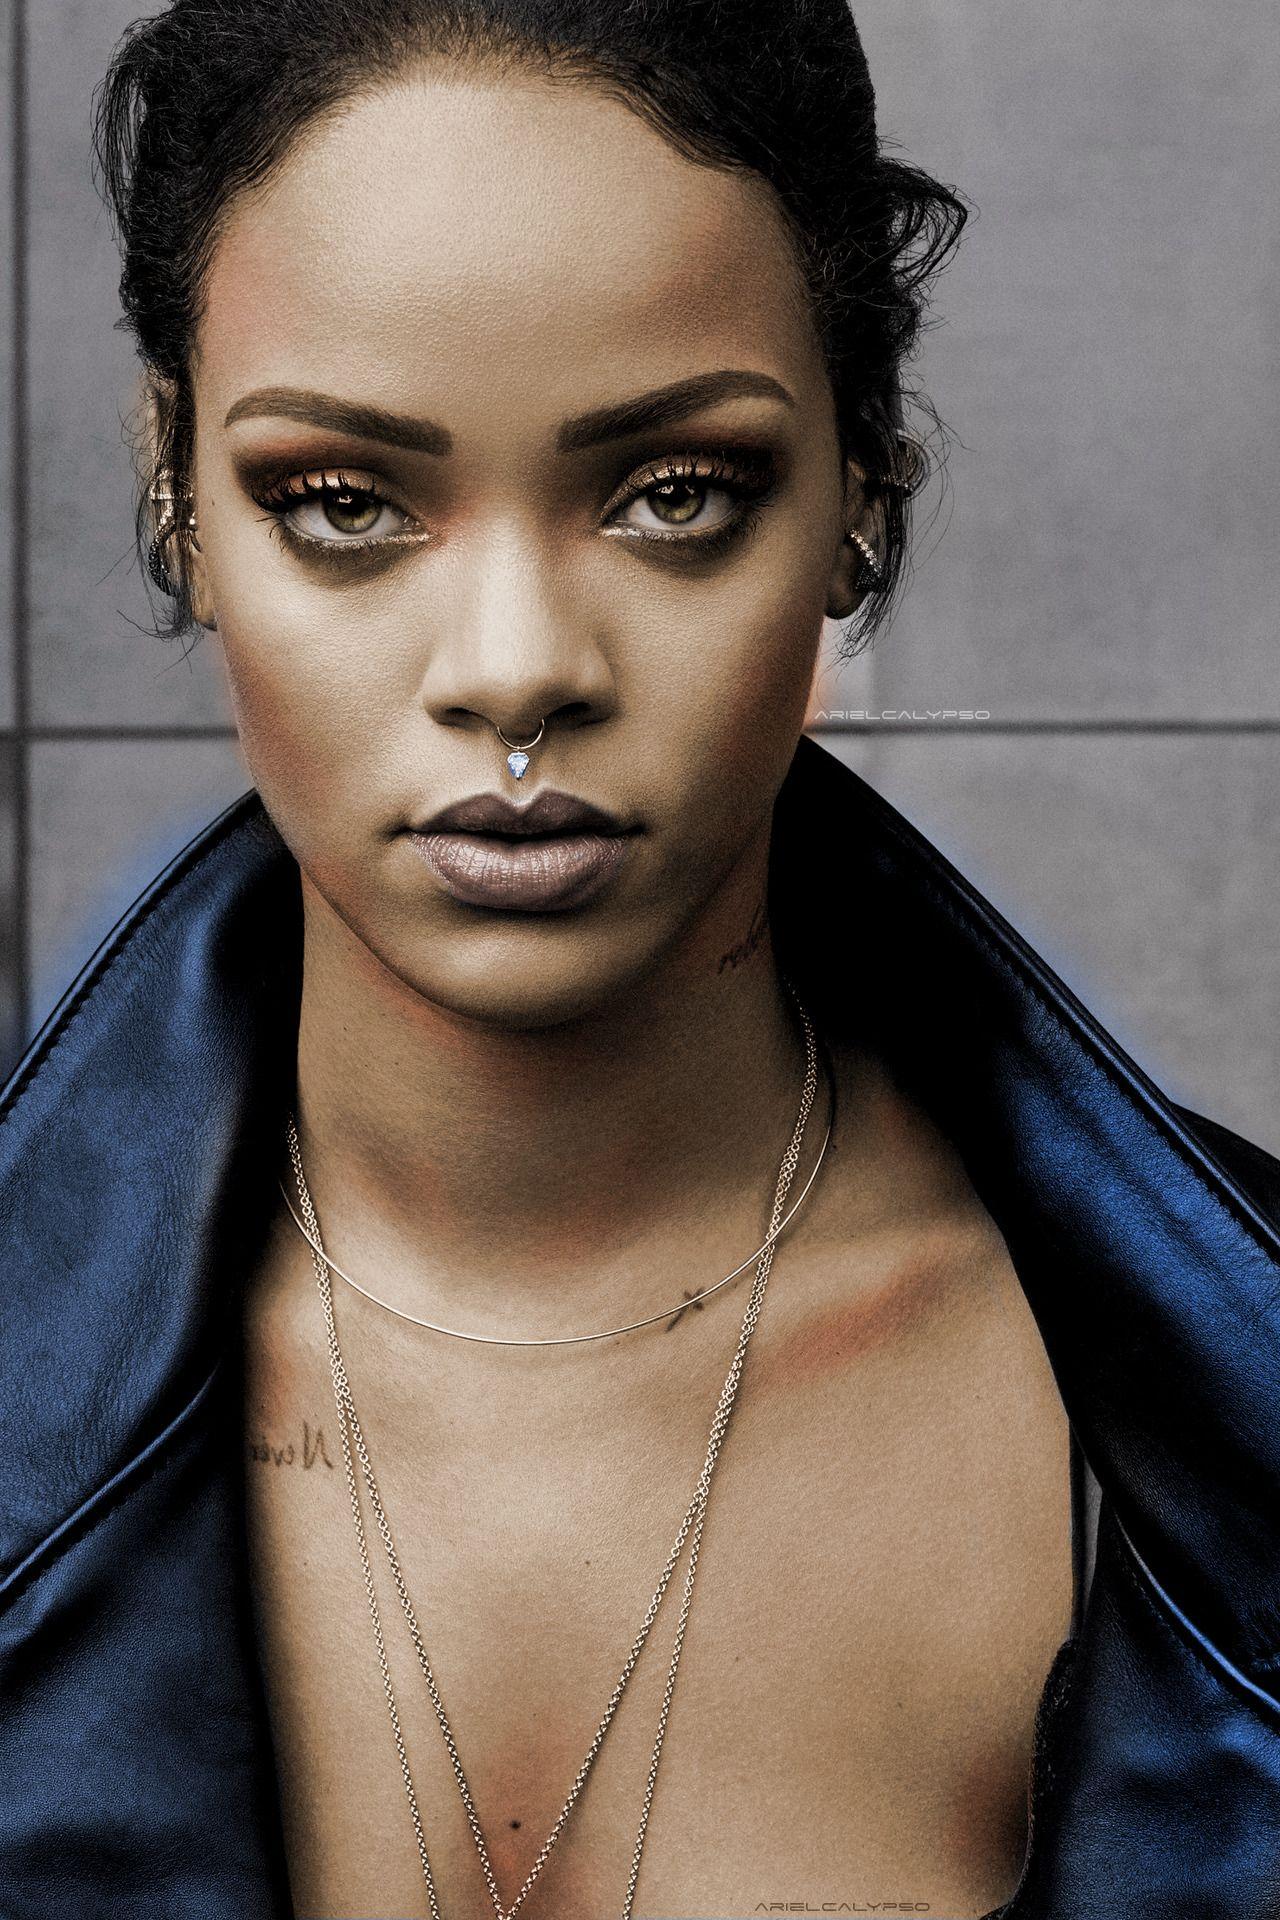 Rihanna for New York Times' T magazine. (October 2015